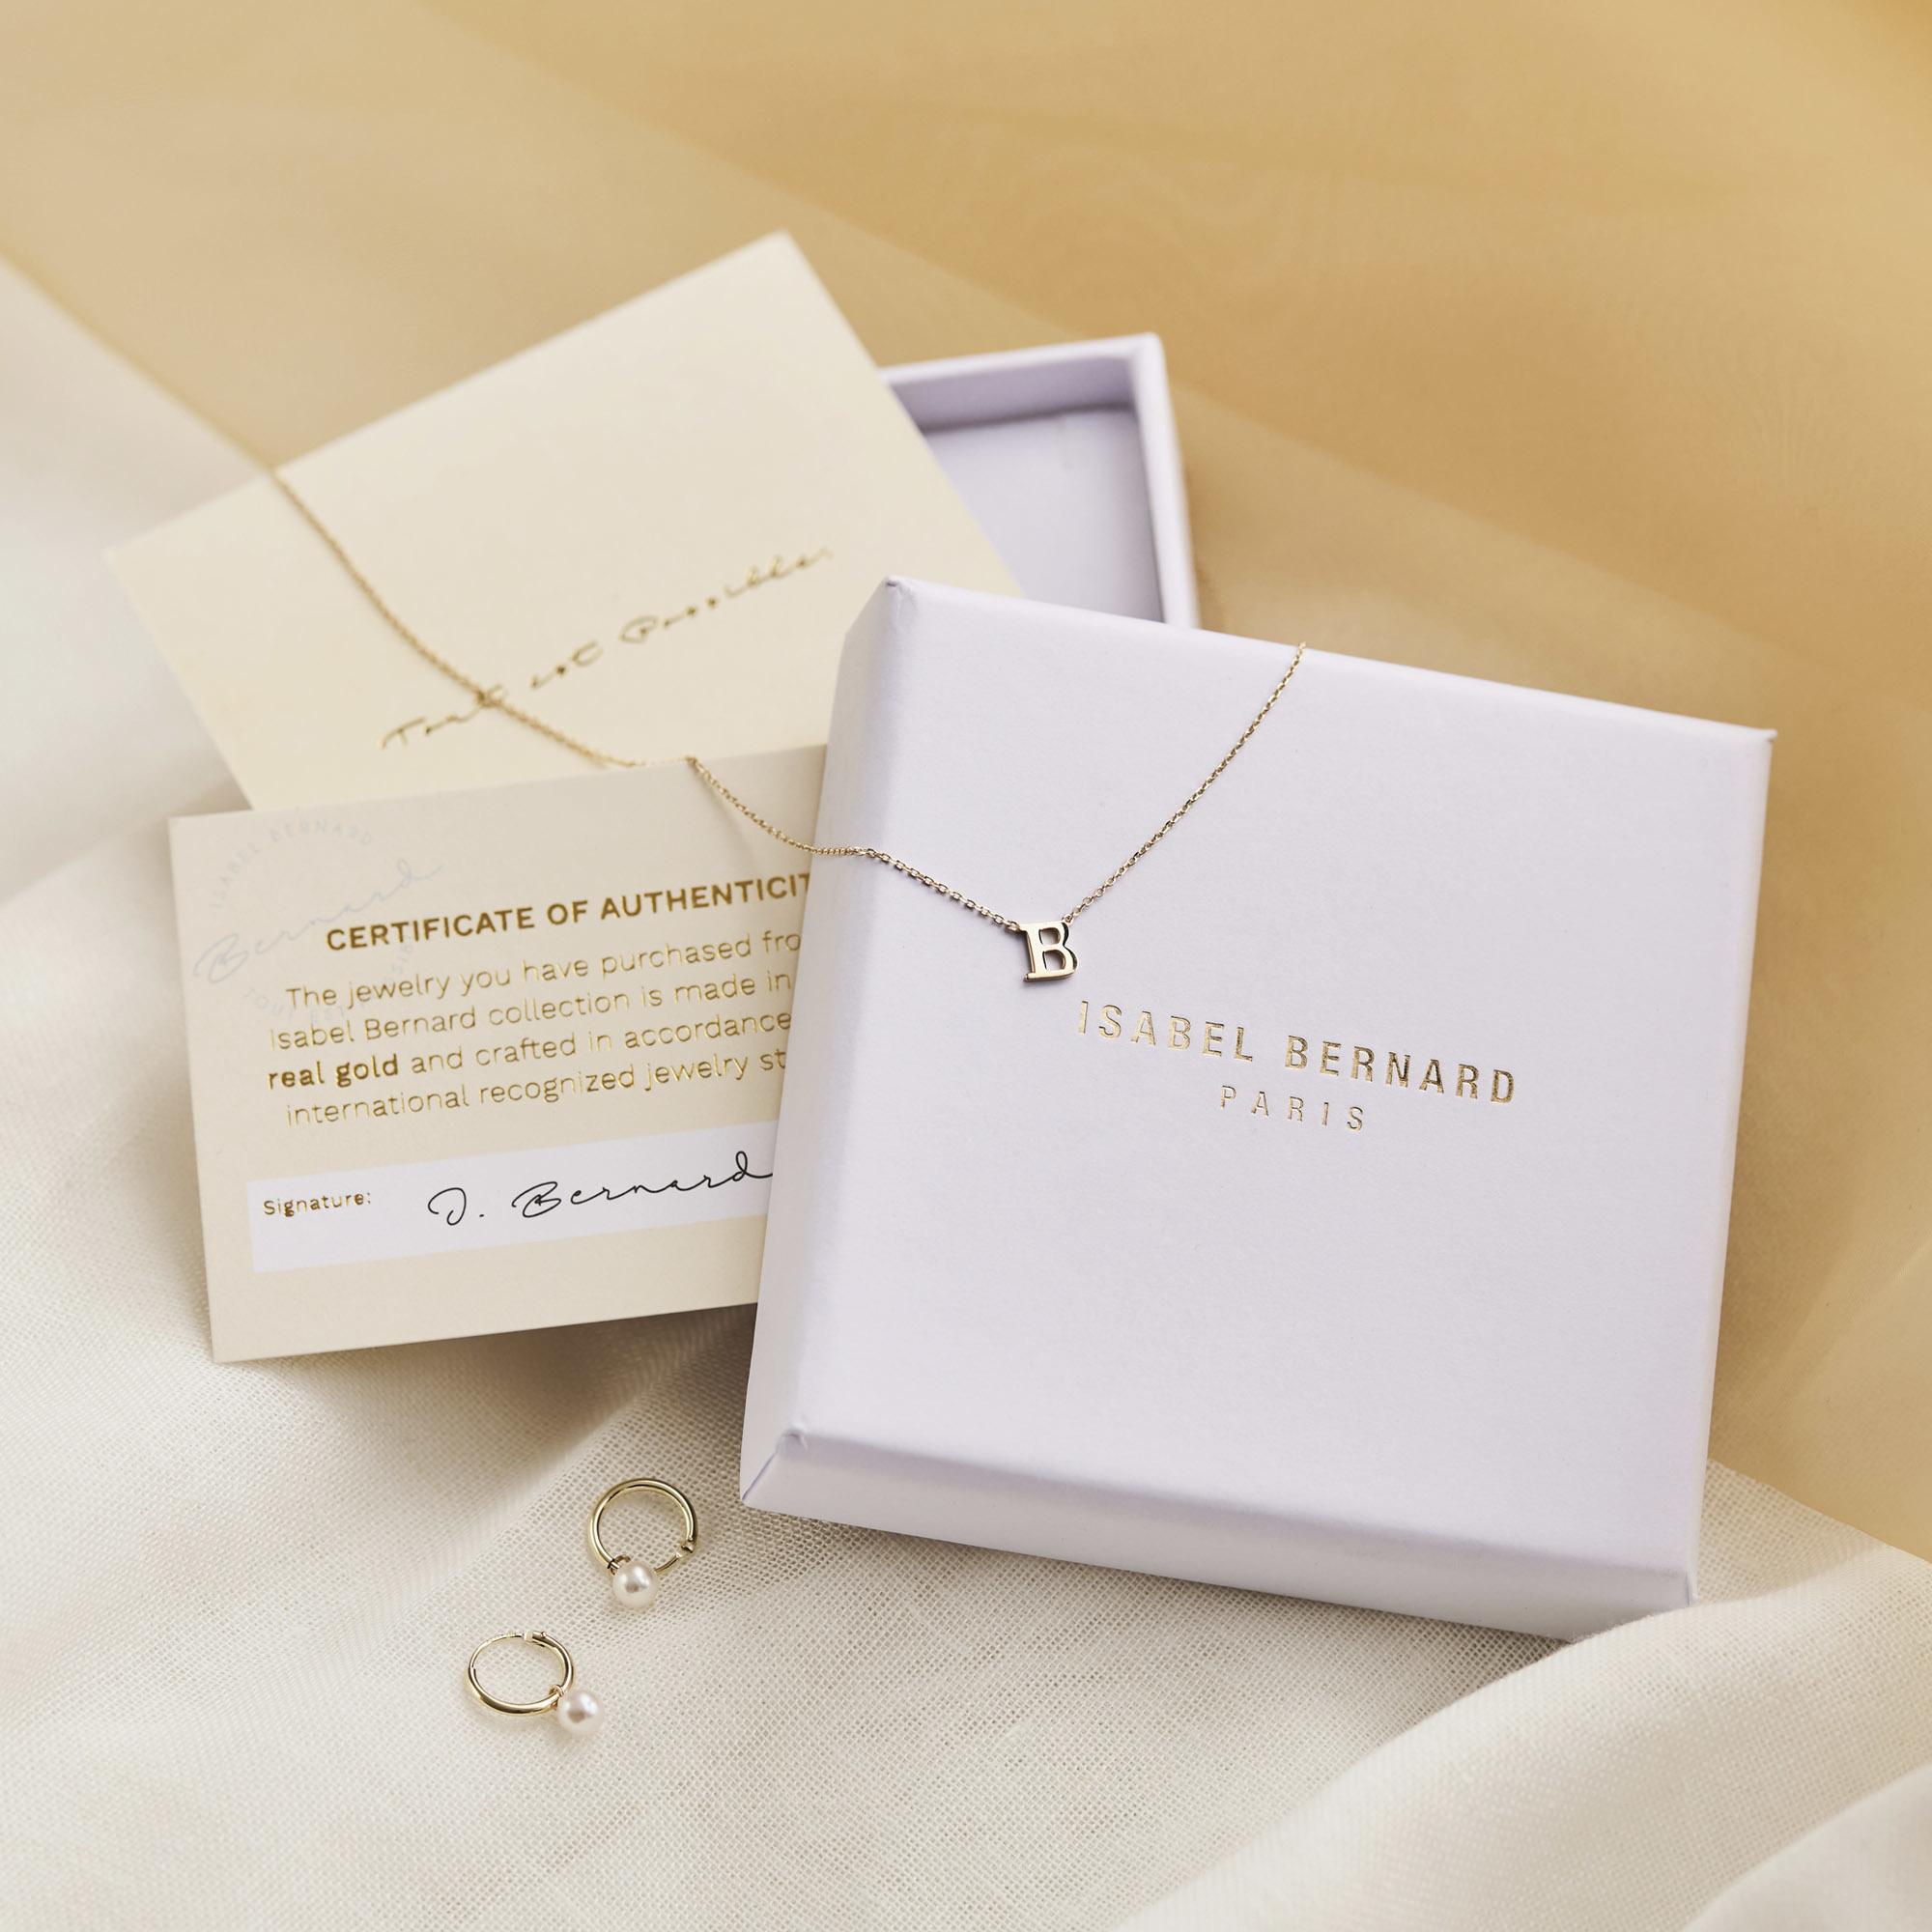 Isabel Bernard Saint Germain du Four orecchini a bottone in oro bianco 14 carati